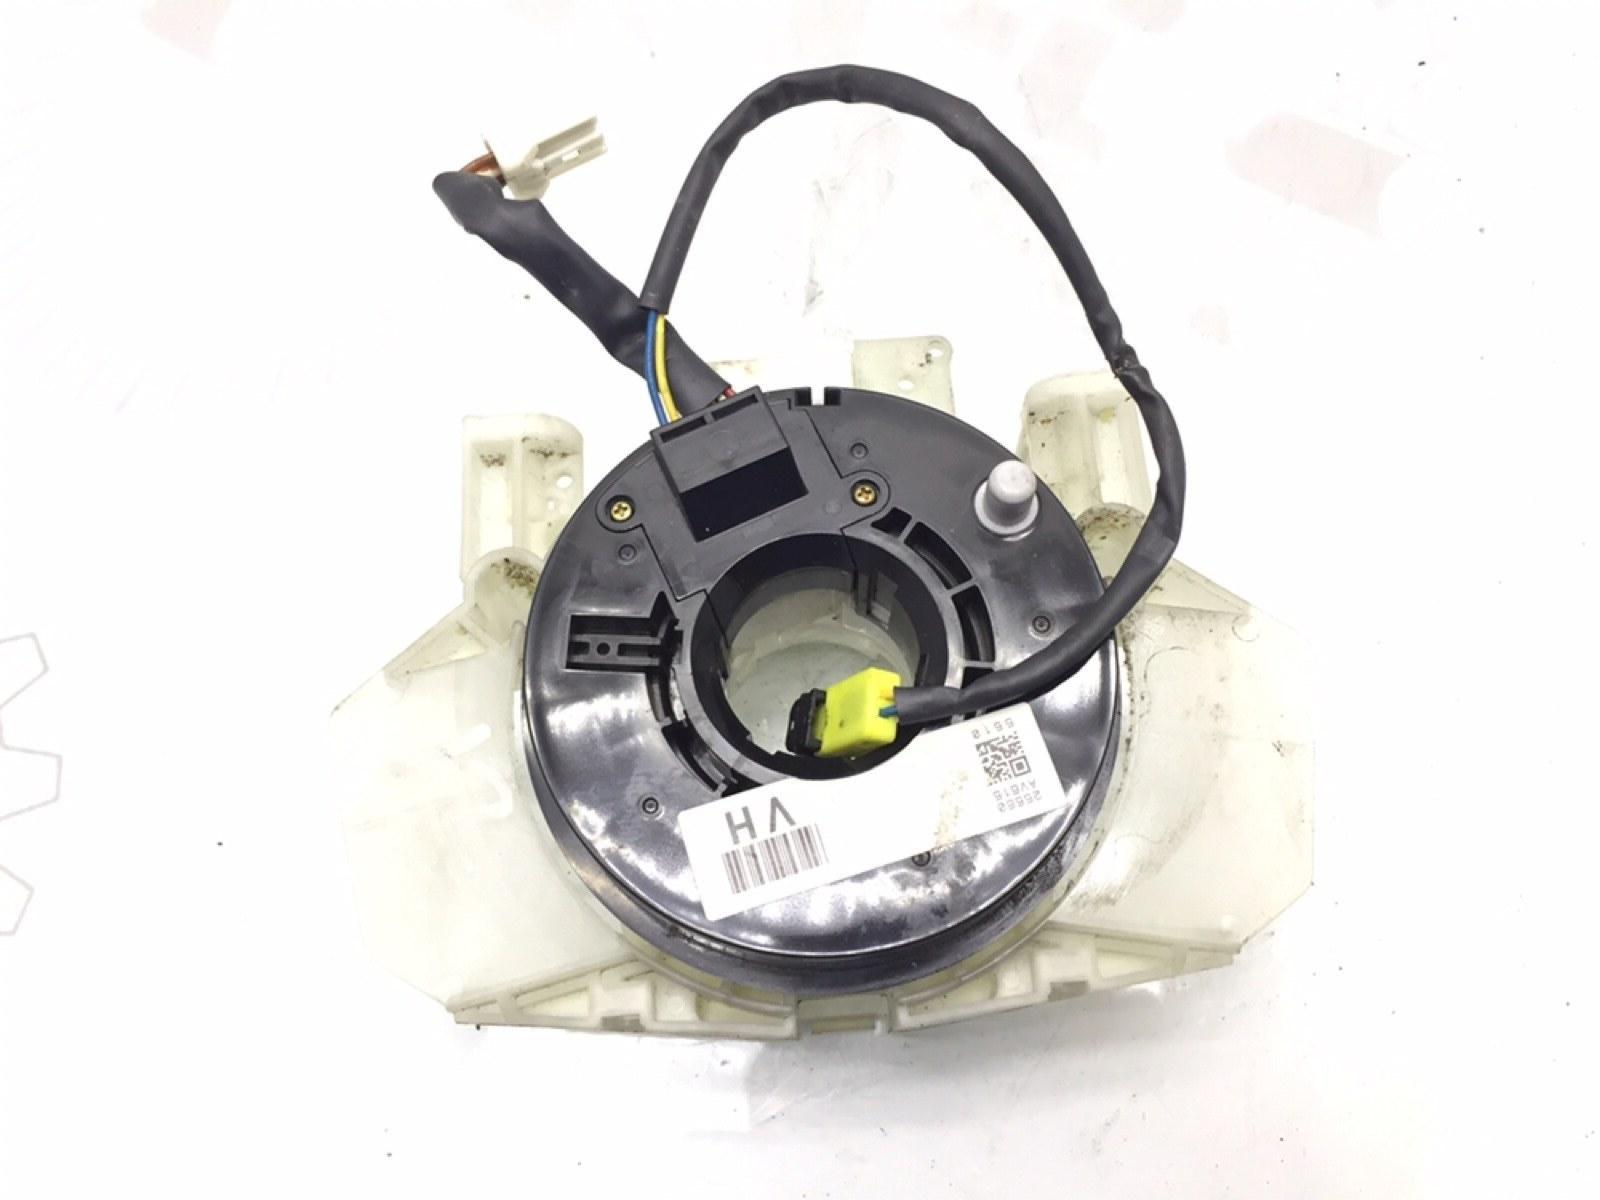 Шлейф руля Nissan Almera Tino 1.8 I 2005 (б/у)